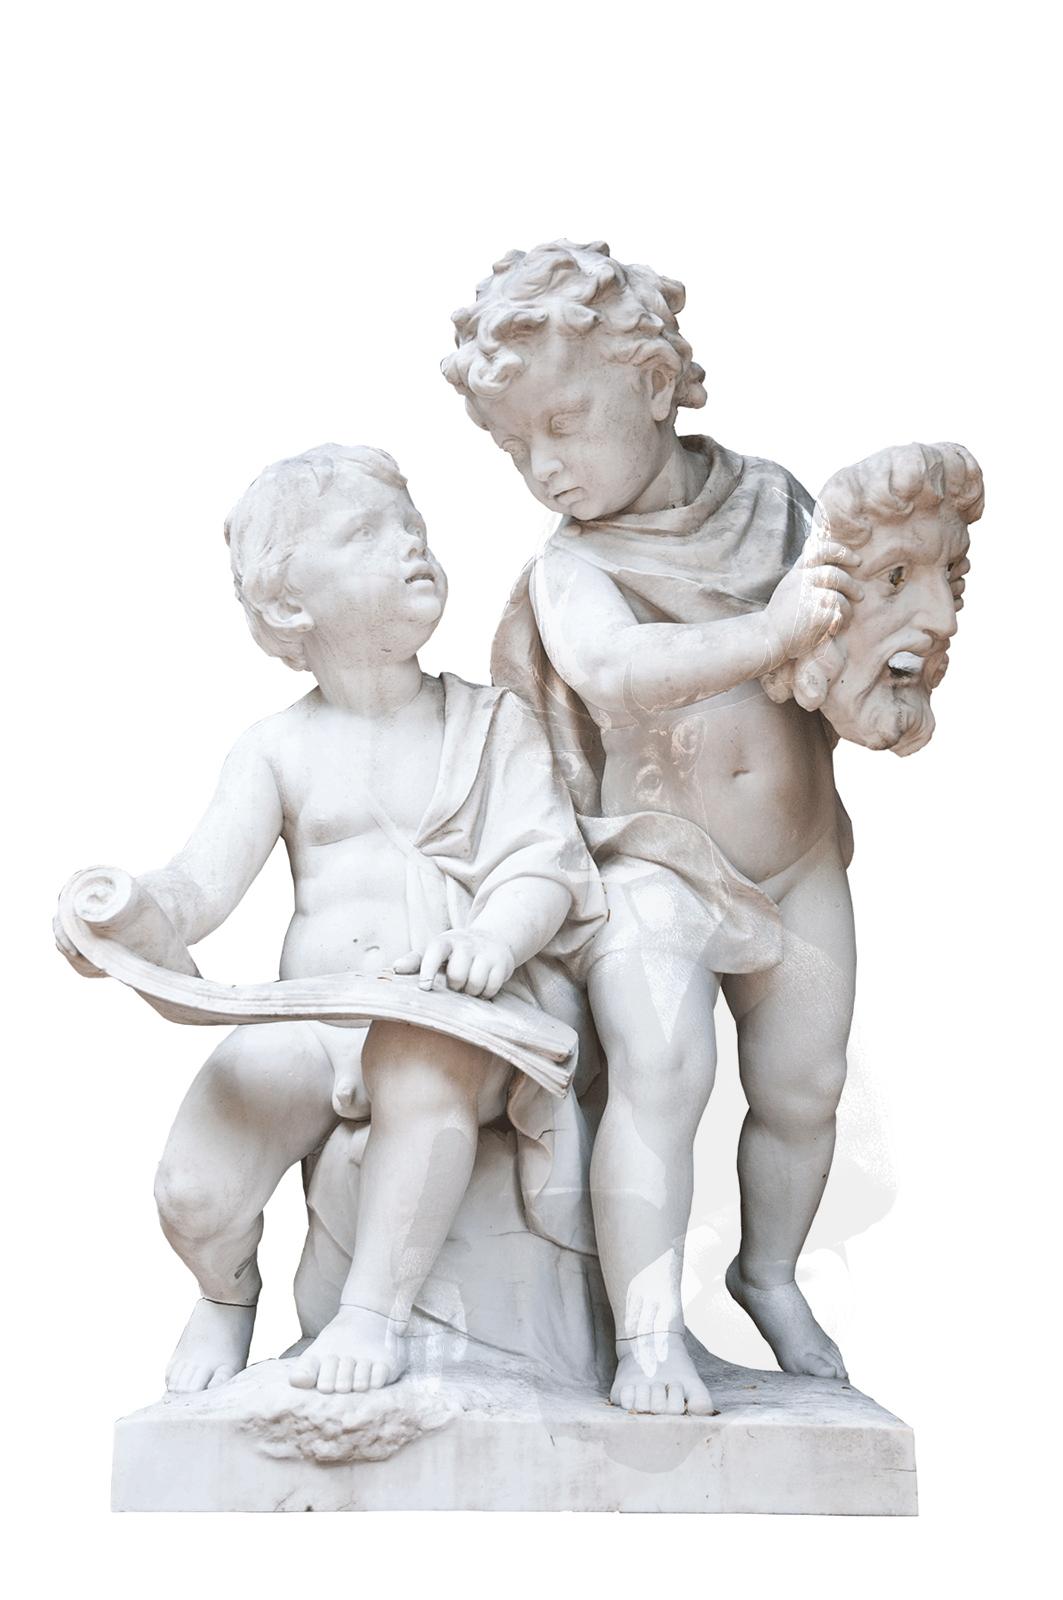 MWD 69; Contest; Statue; Marble